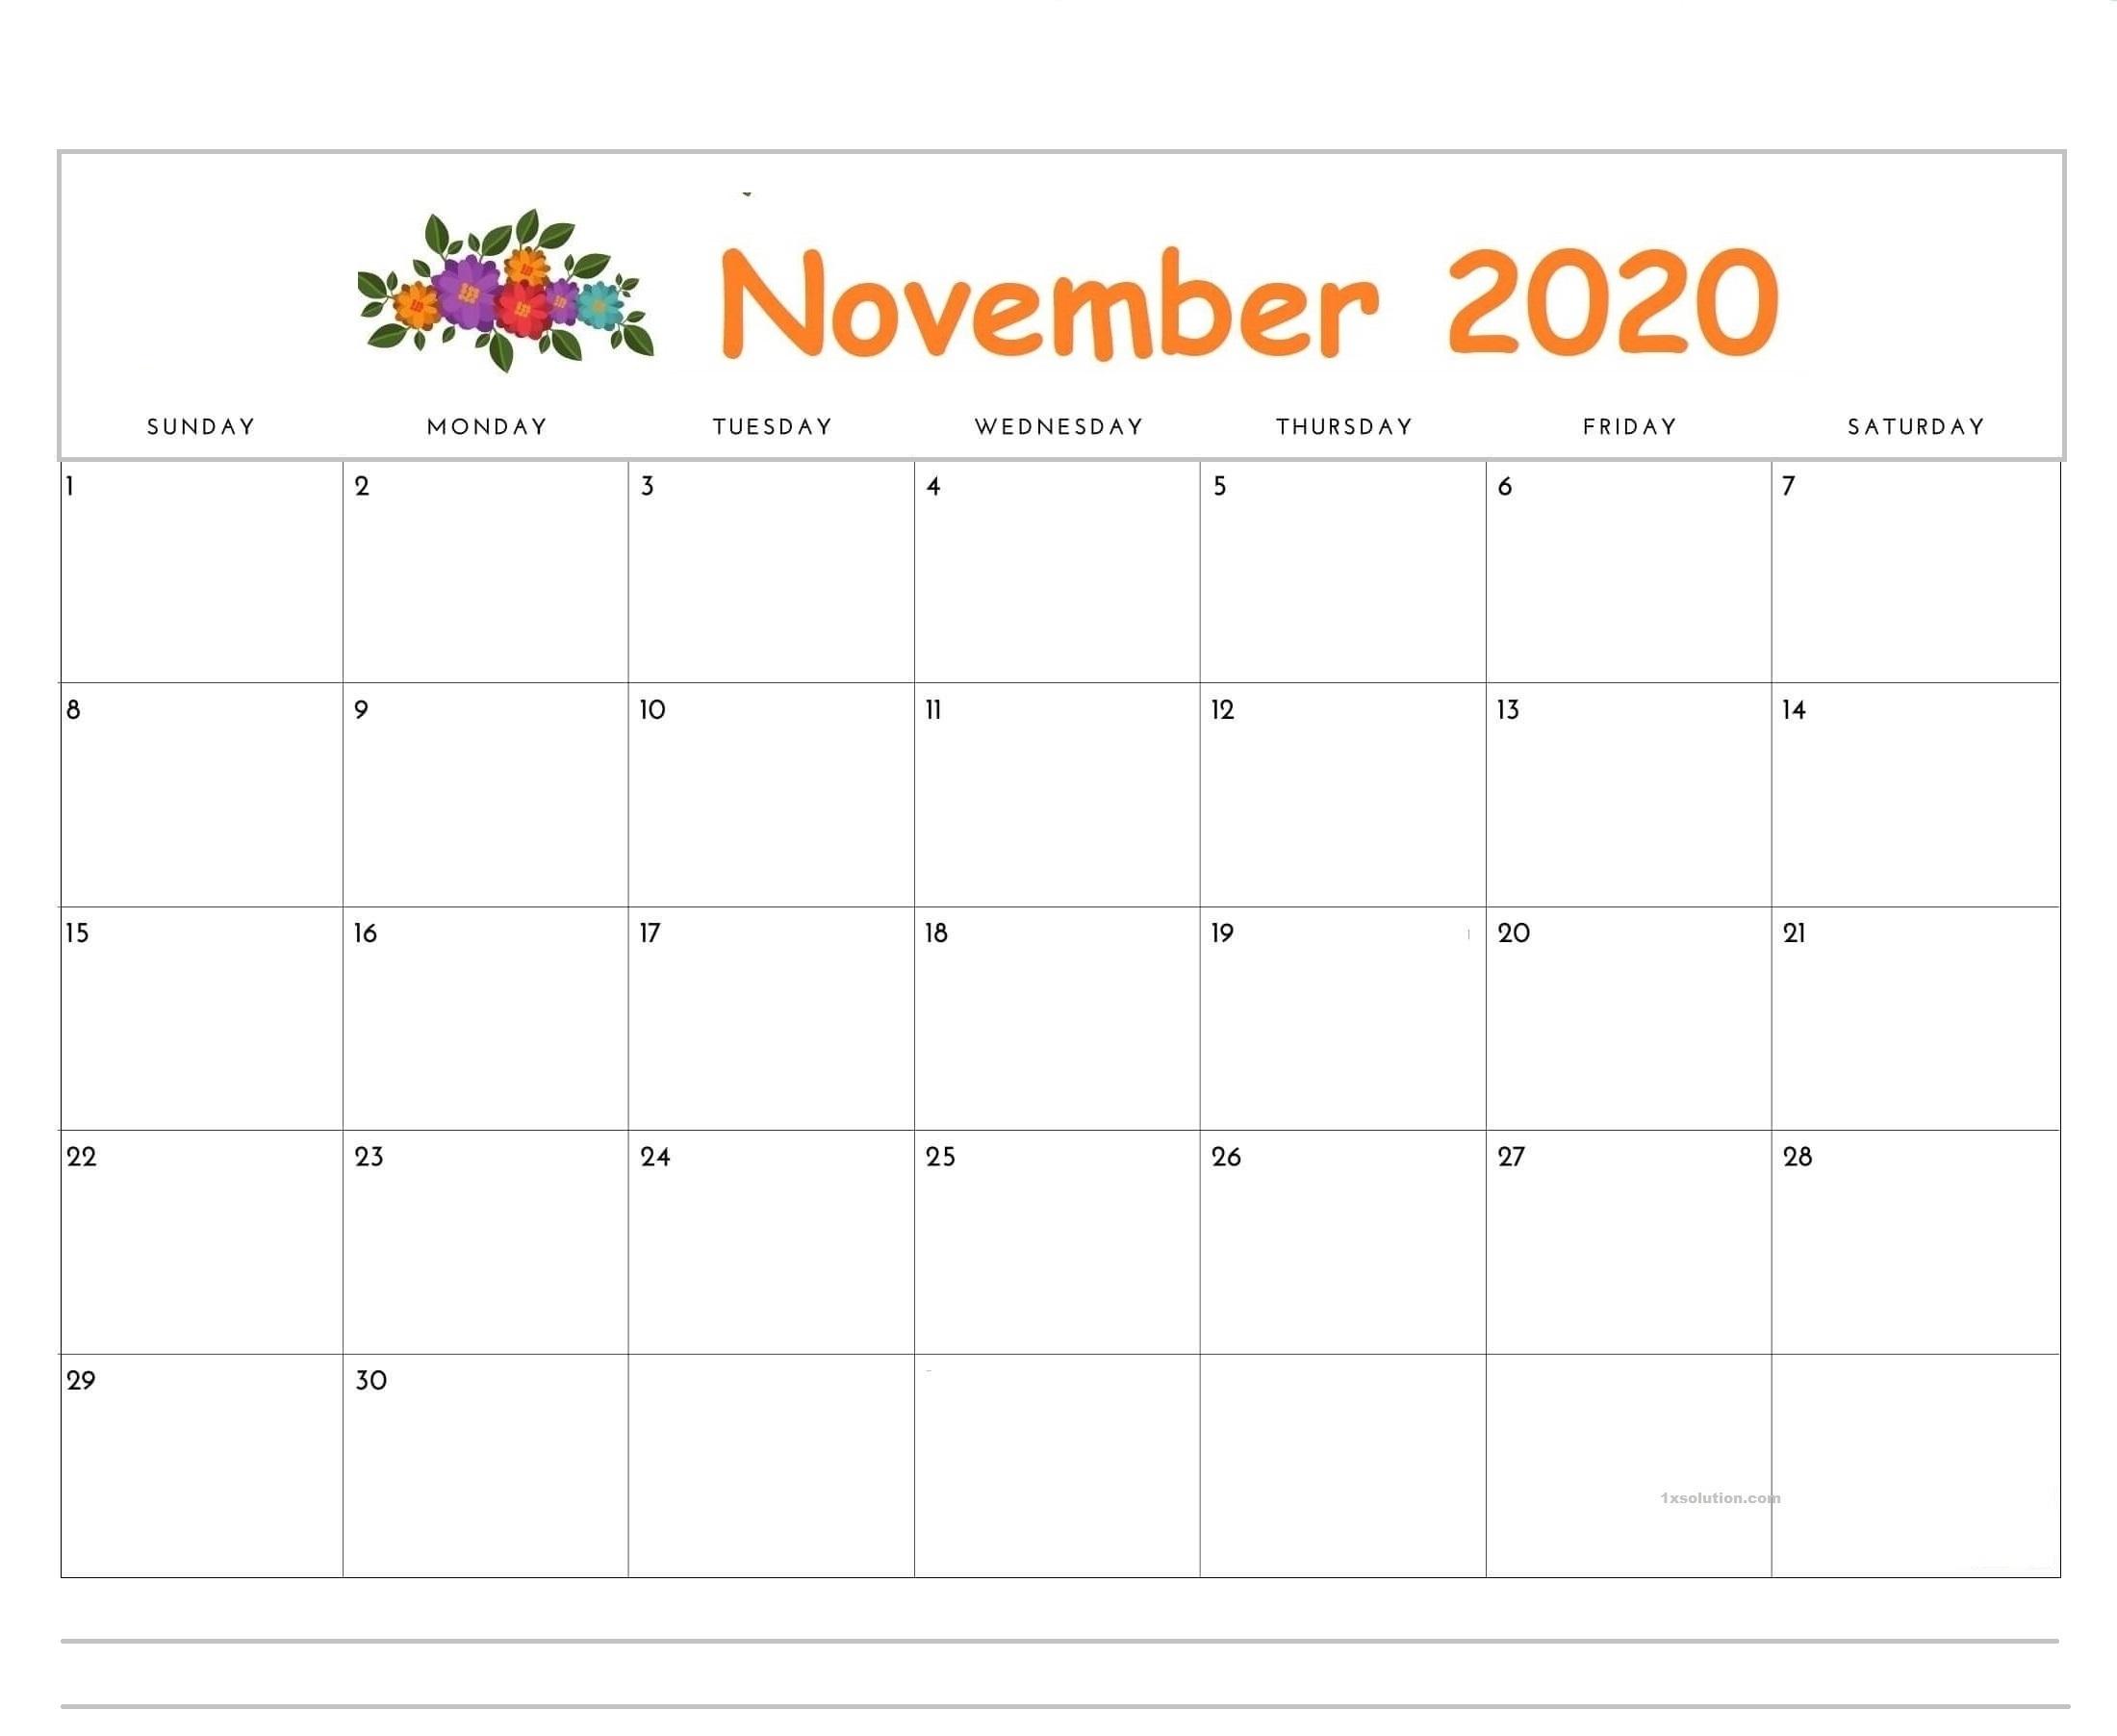 November 2020 Blank Calendar